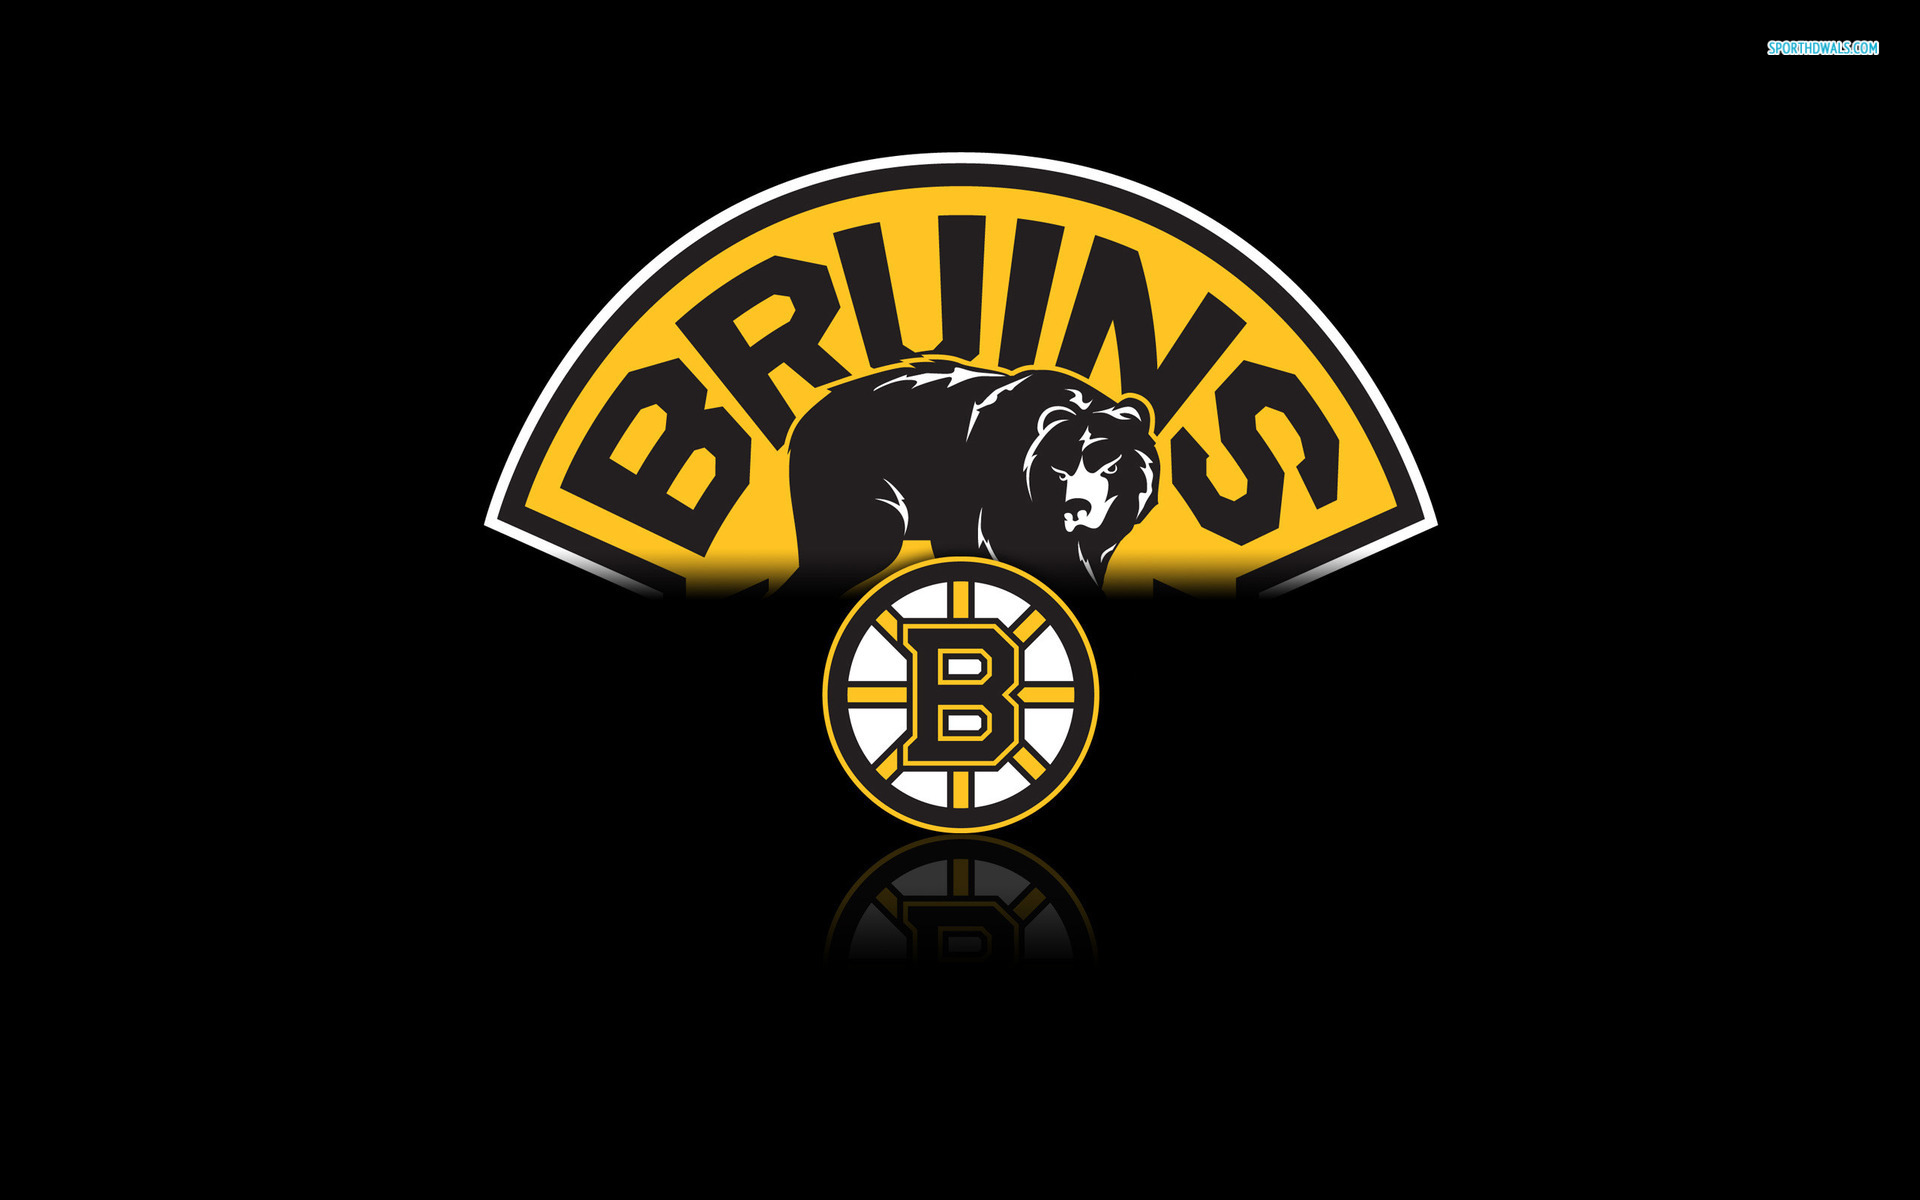 Boston Bruins wallpaper 1920x1200